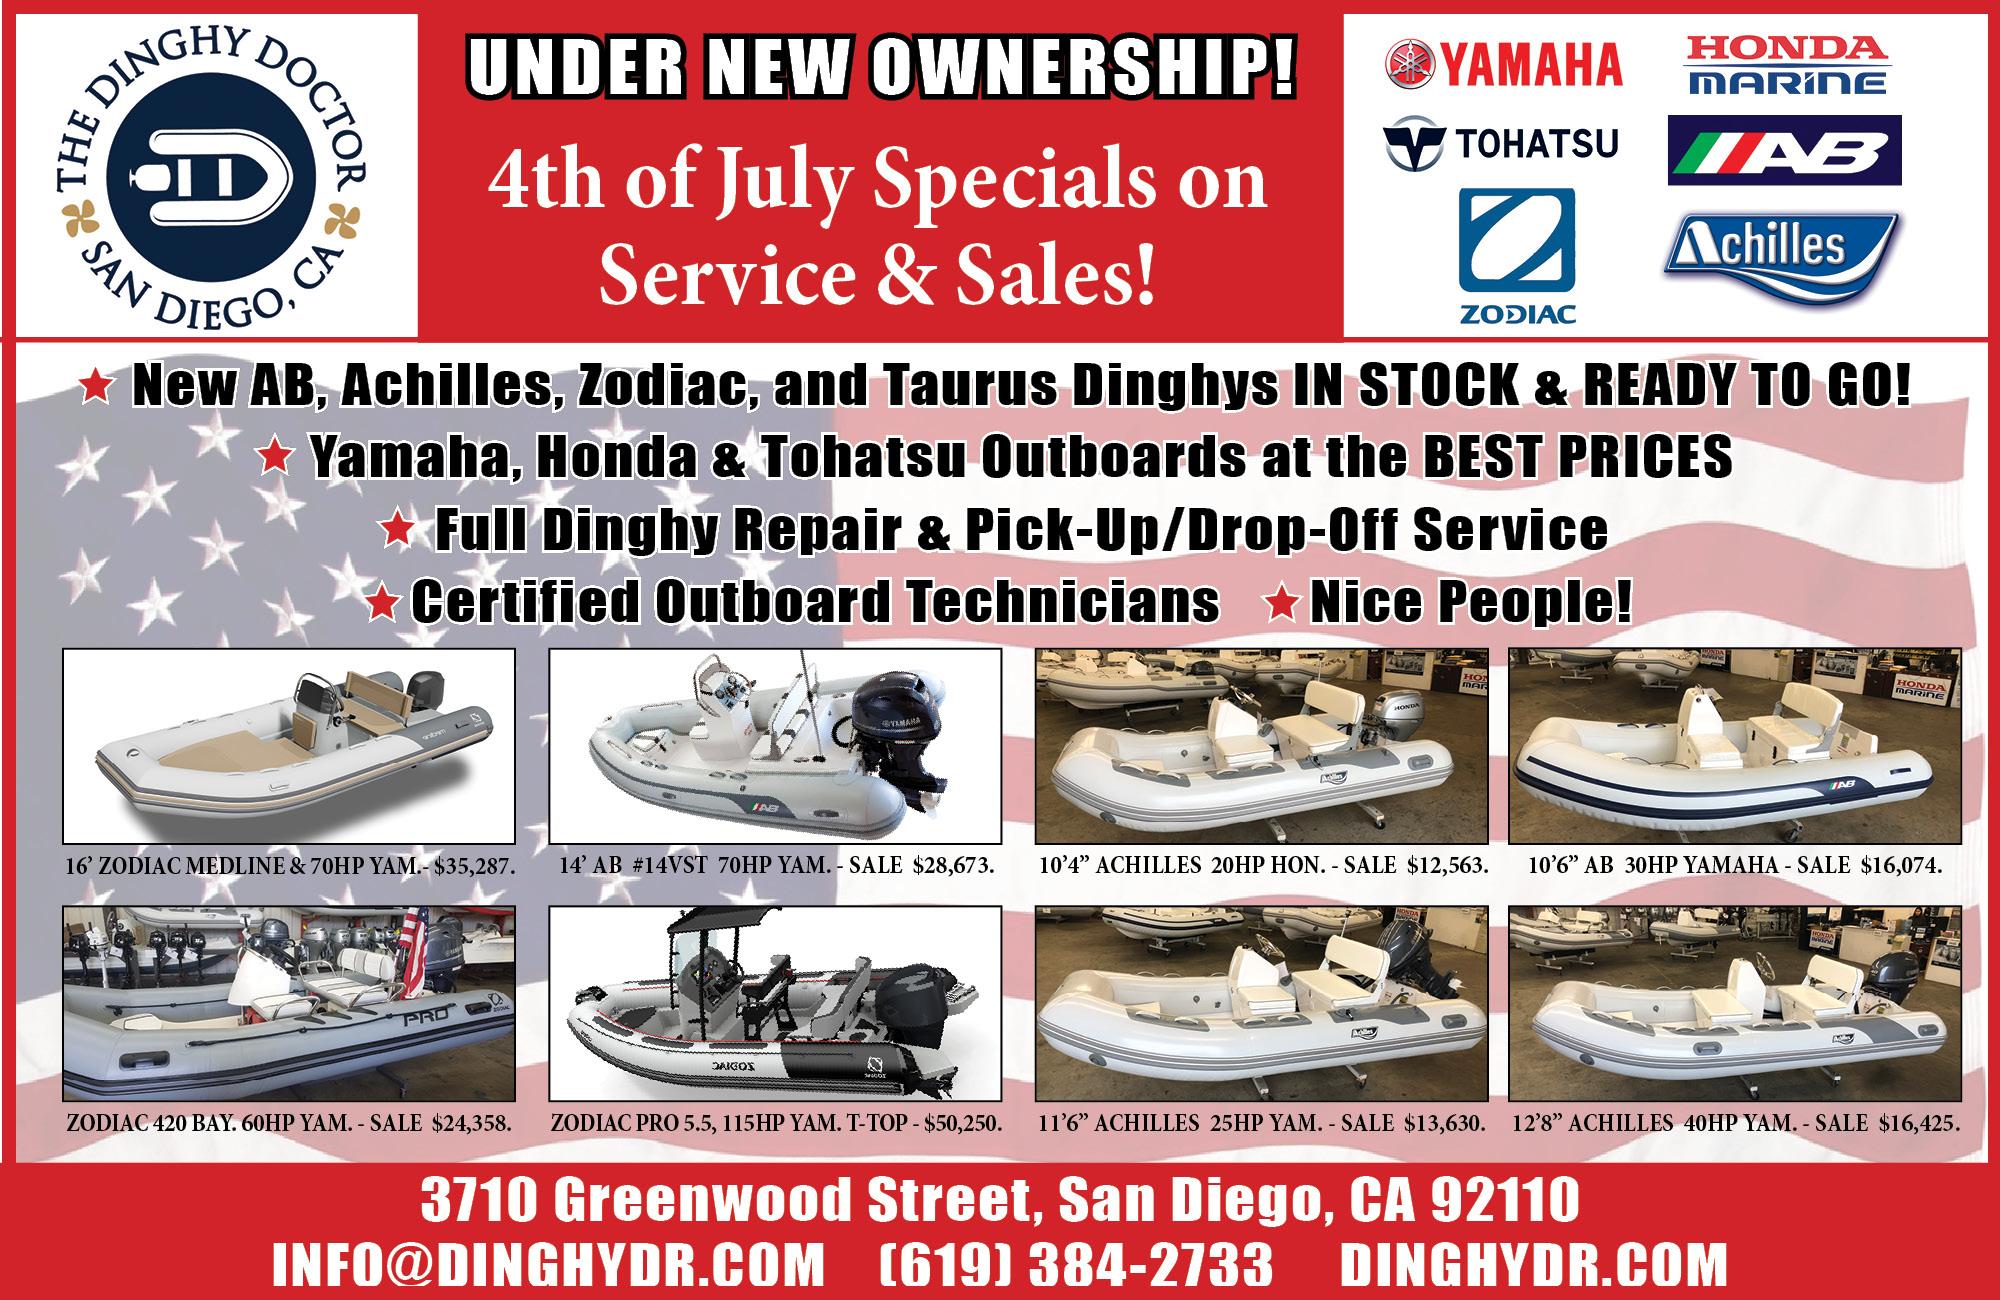 Yamaha, Honda & Tohatsu Ouboard Motors in San Diego - Dinghy